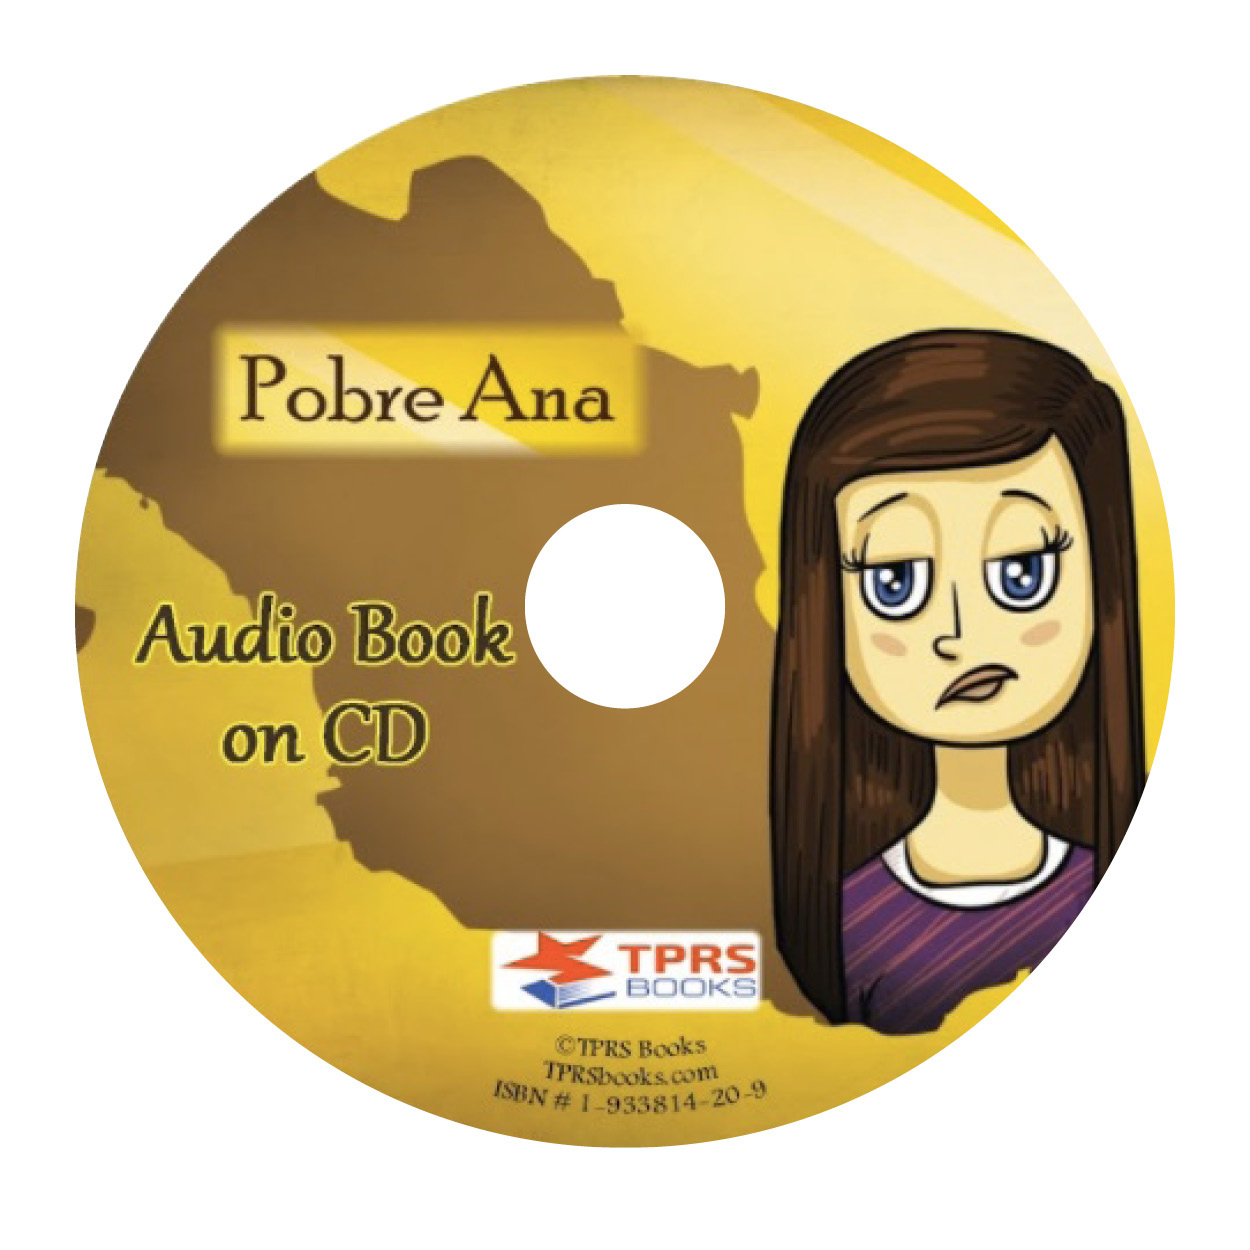 Pobre Ana - Luisterboek